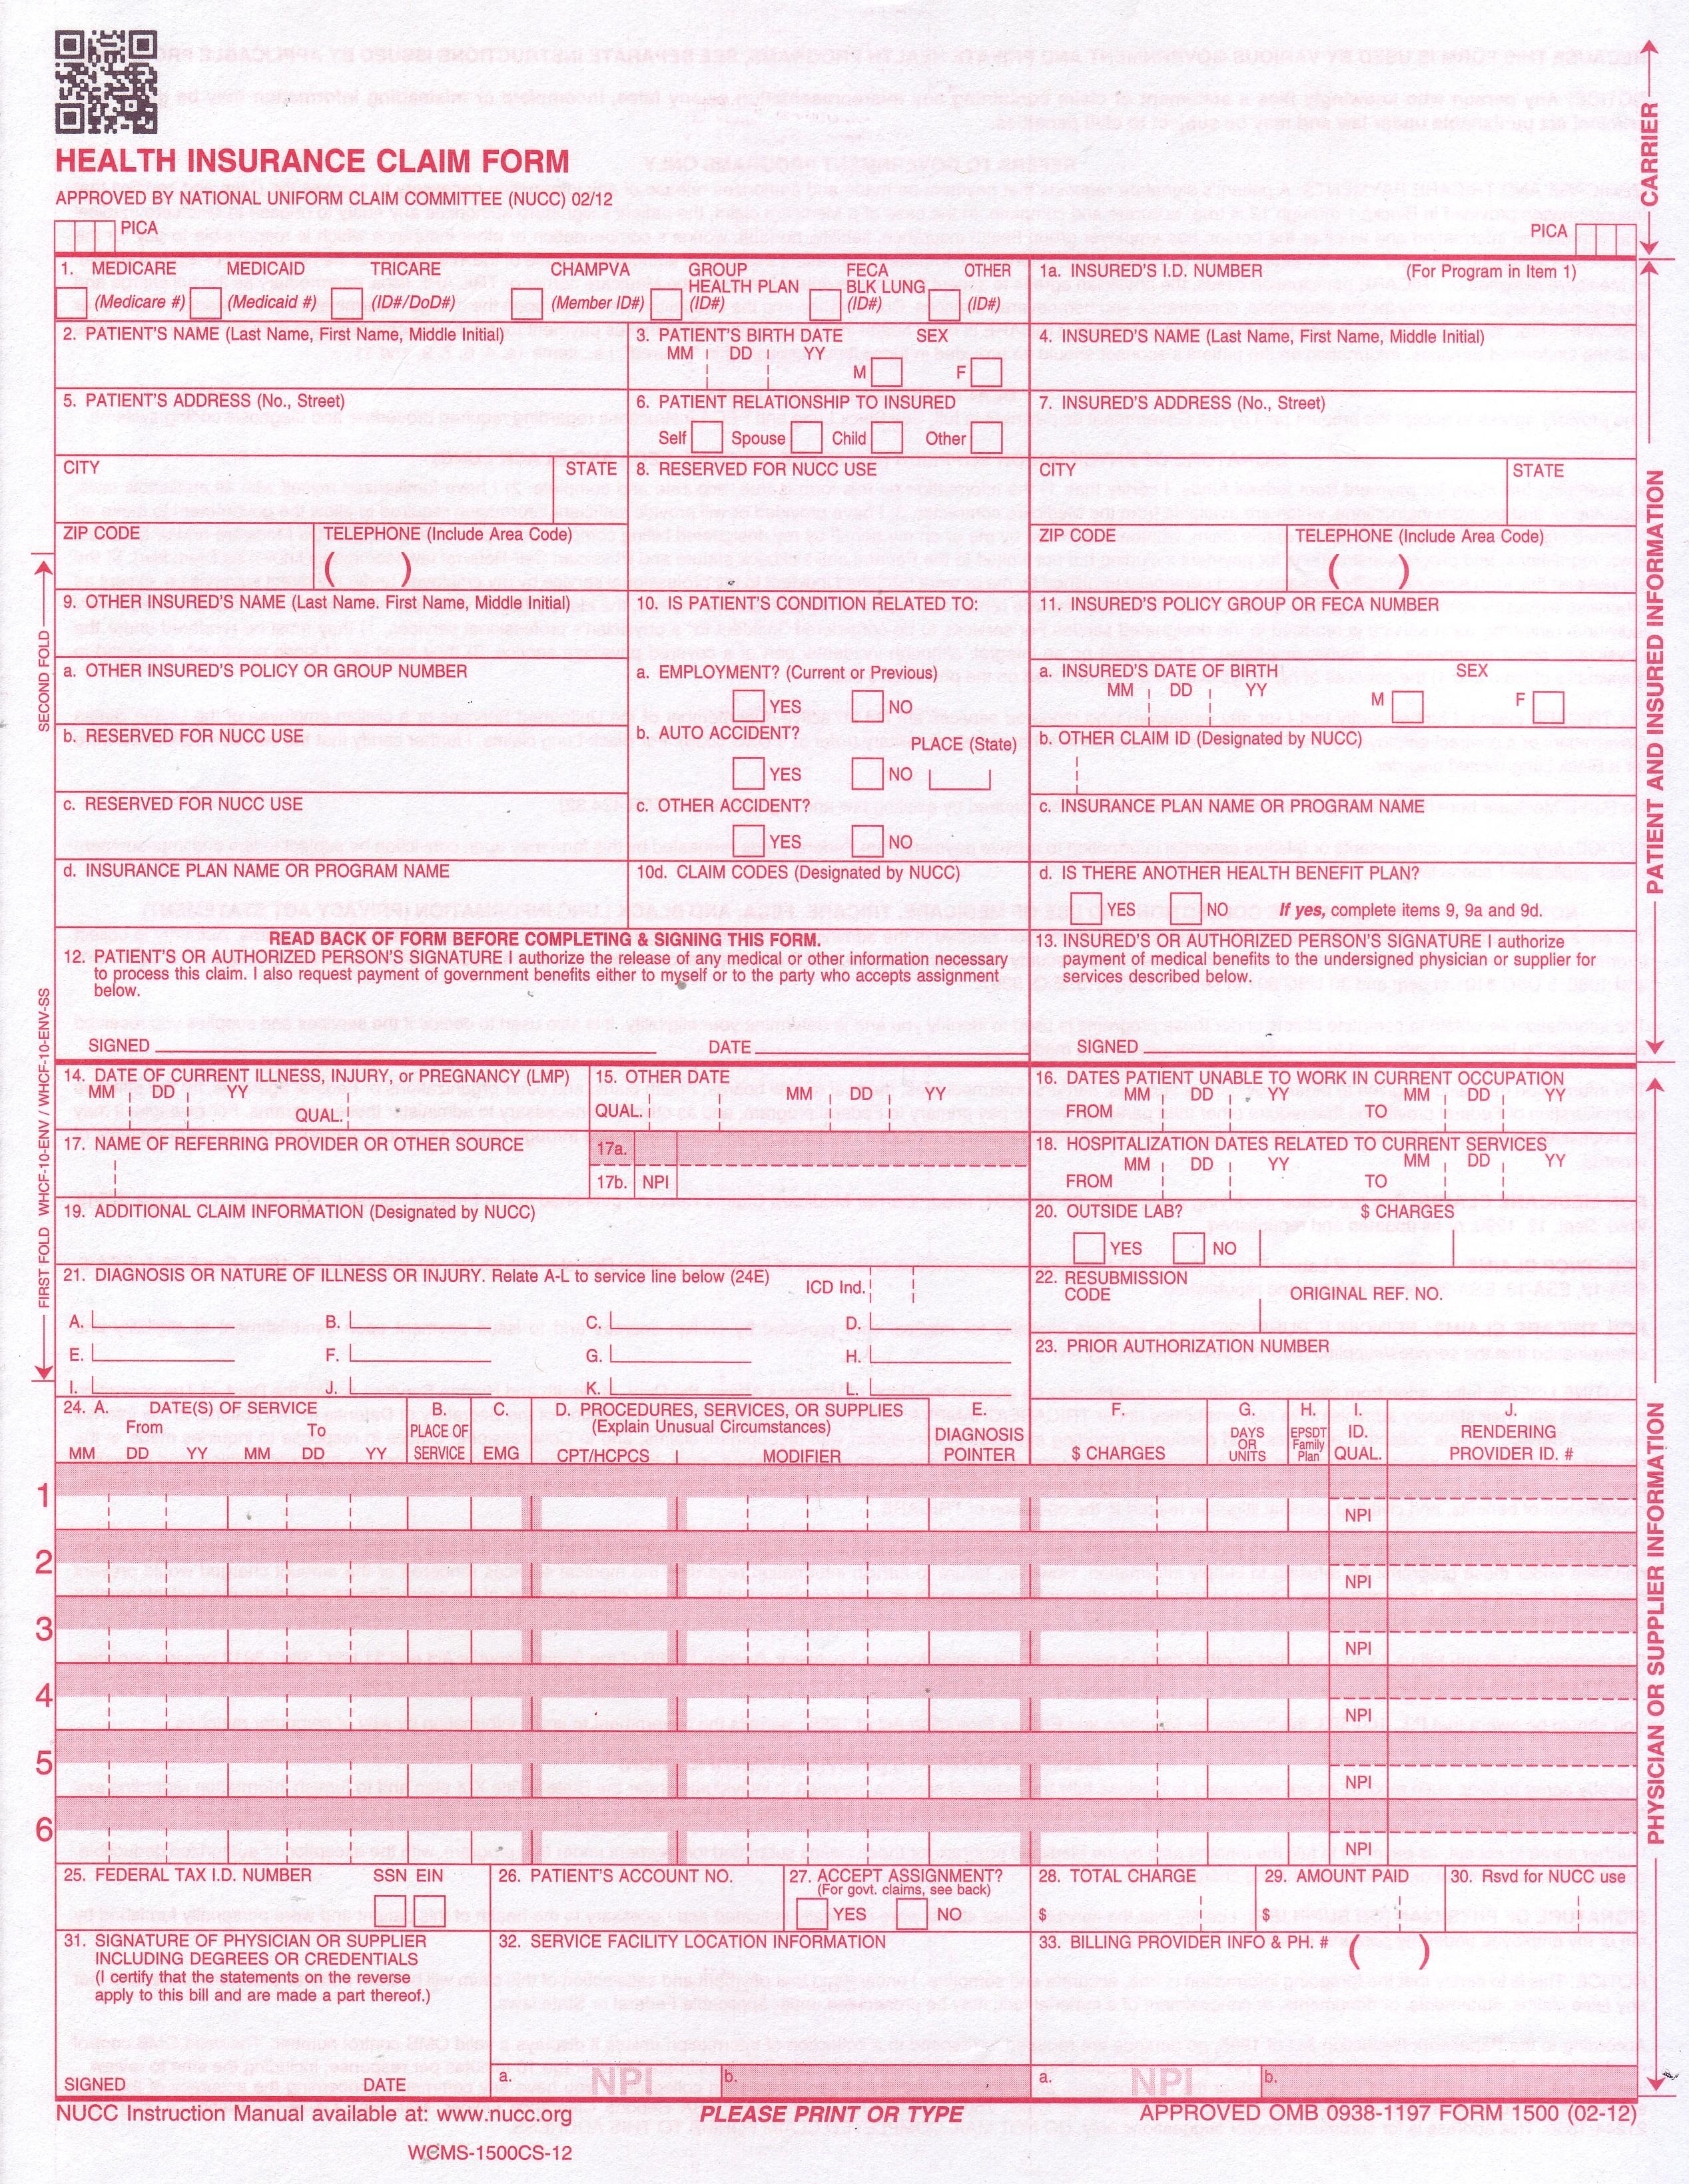 Sample Hcfa 1500 Form Pdf